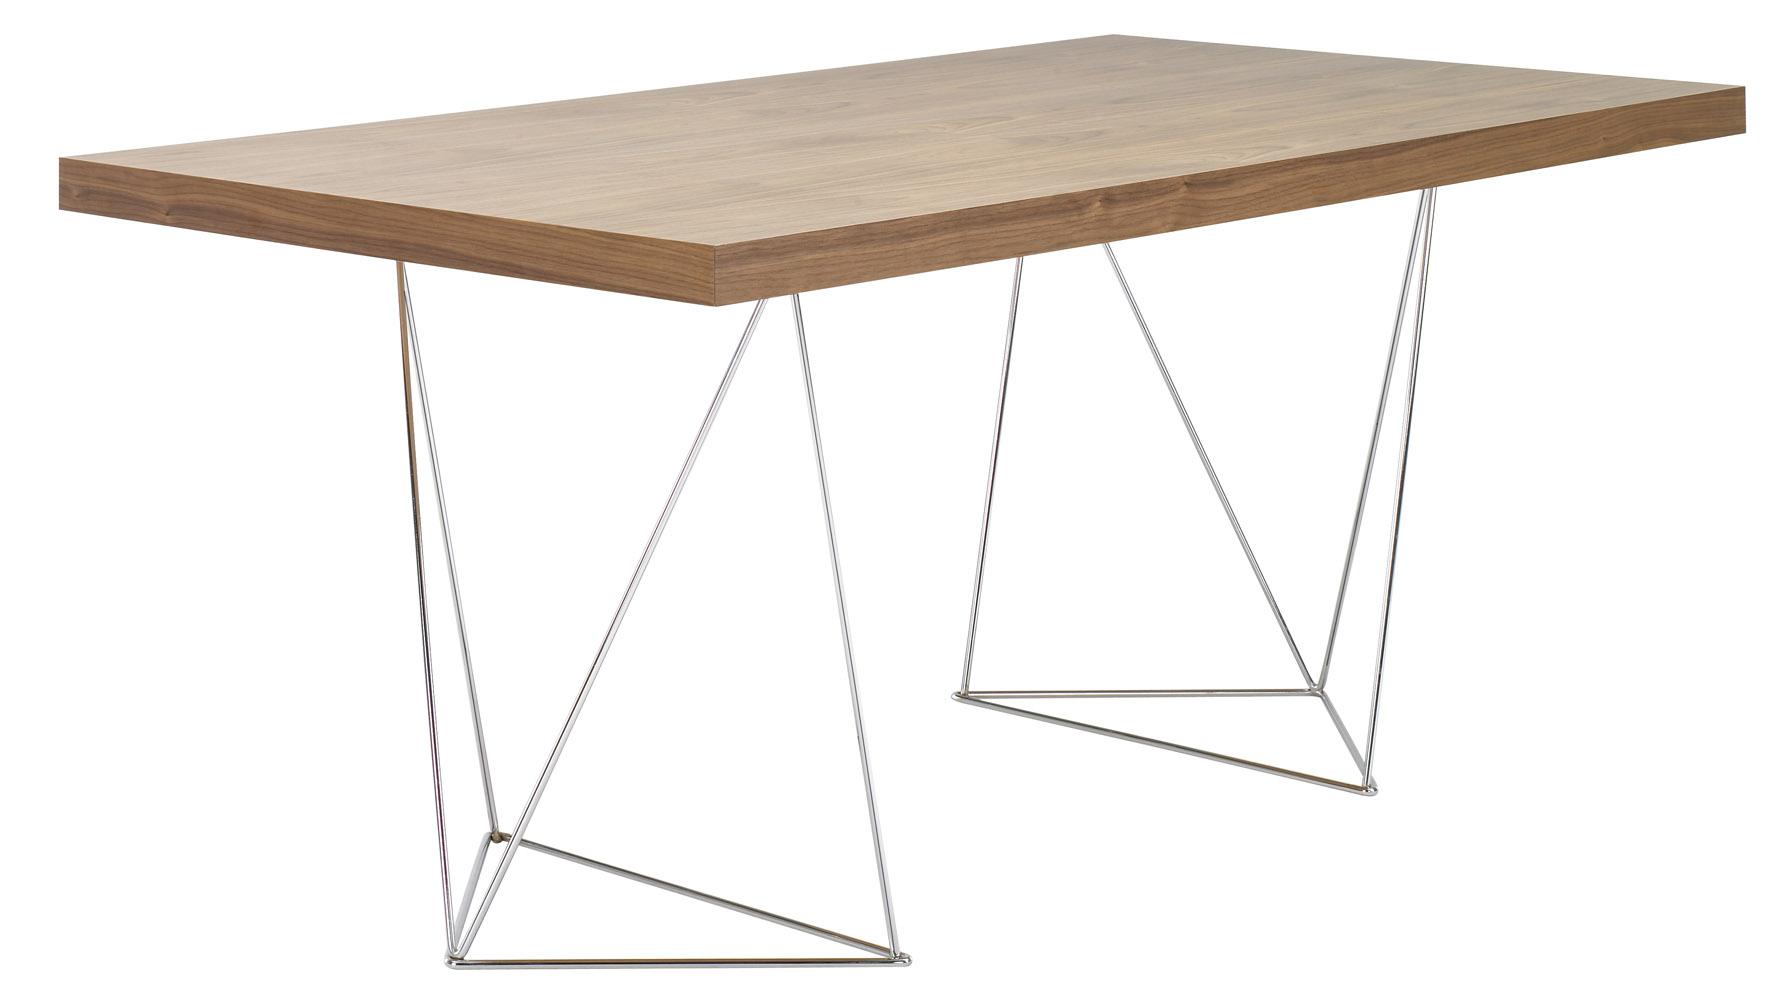 Zahara Table 71quot Zuri Furniture : zahara71 diningtablewithchromelegswalnut 2 from www.zurifurniture.com size 1778 x 1000 jpeg 146kB